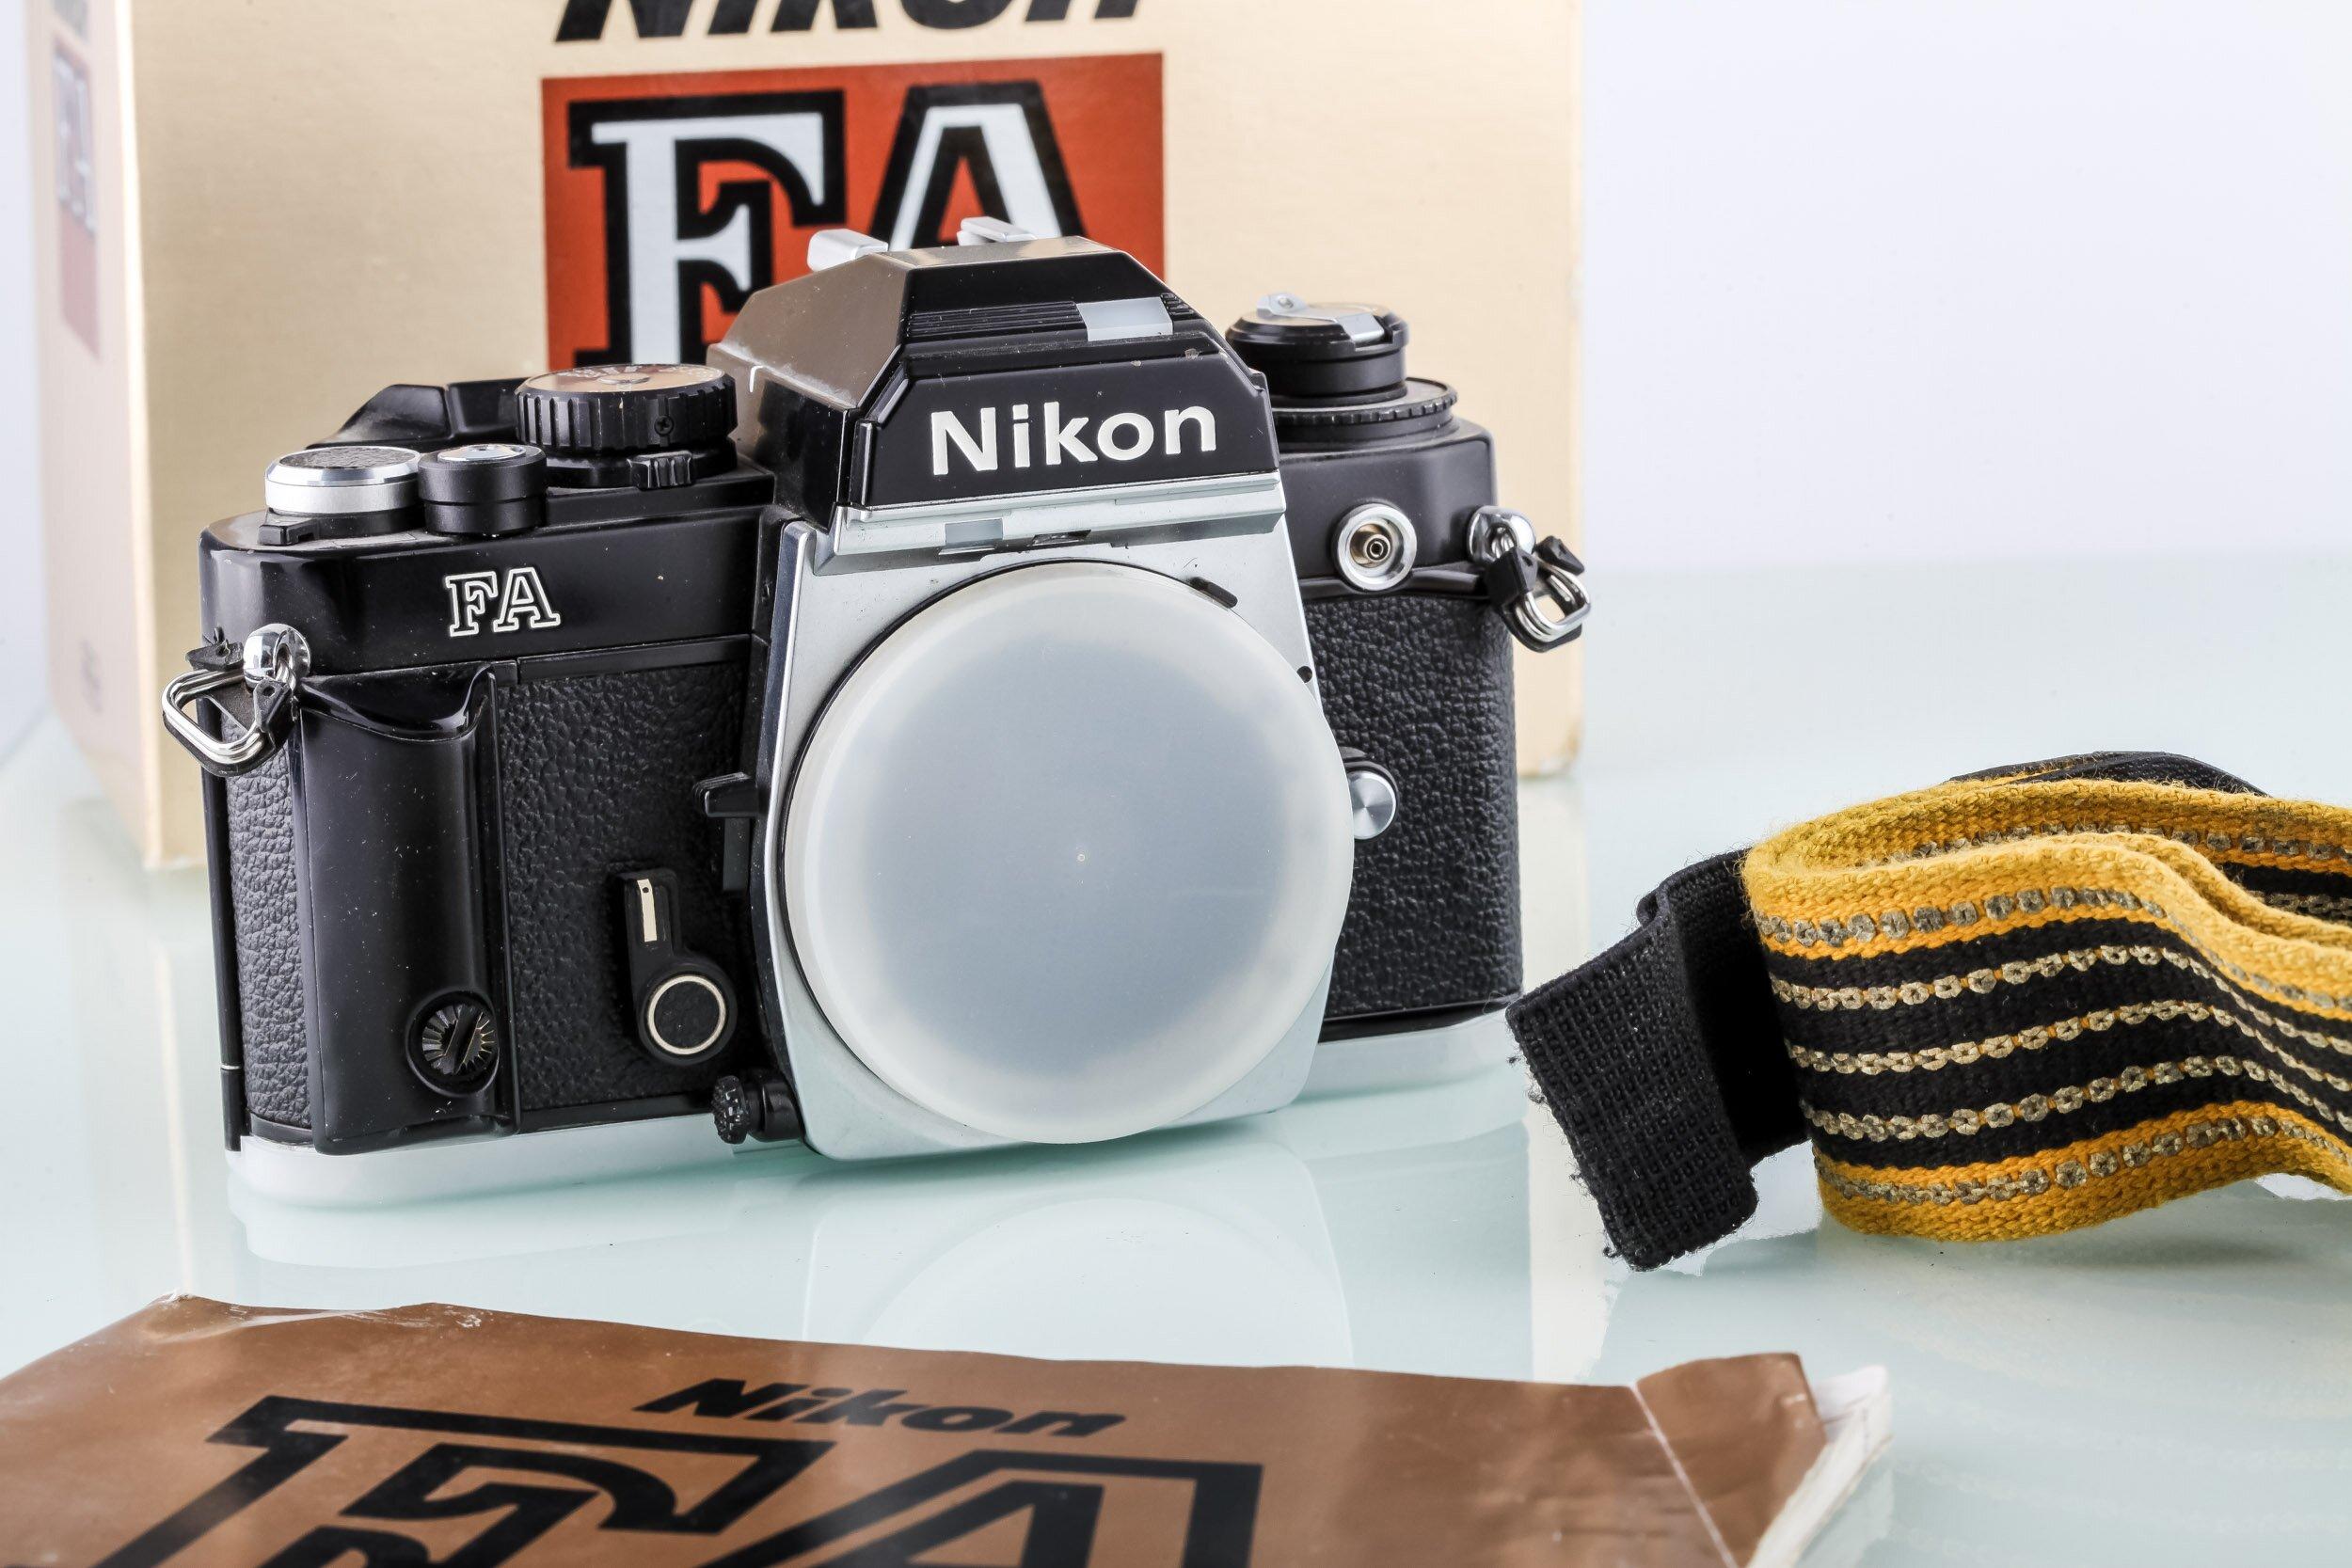 Nikon FA Gehäuse Analoge Spiegelreflexkamera